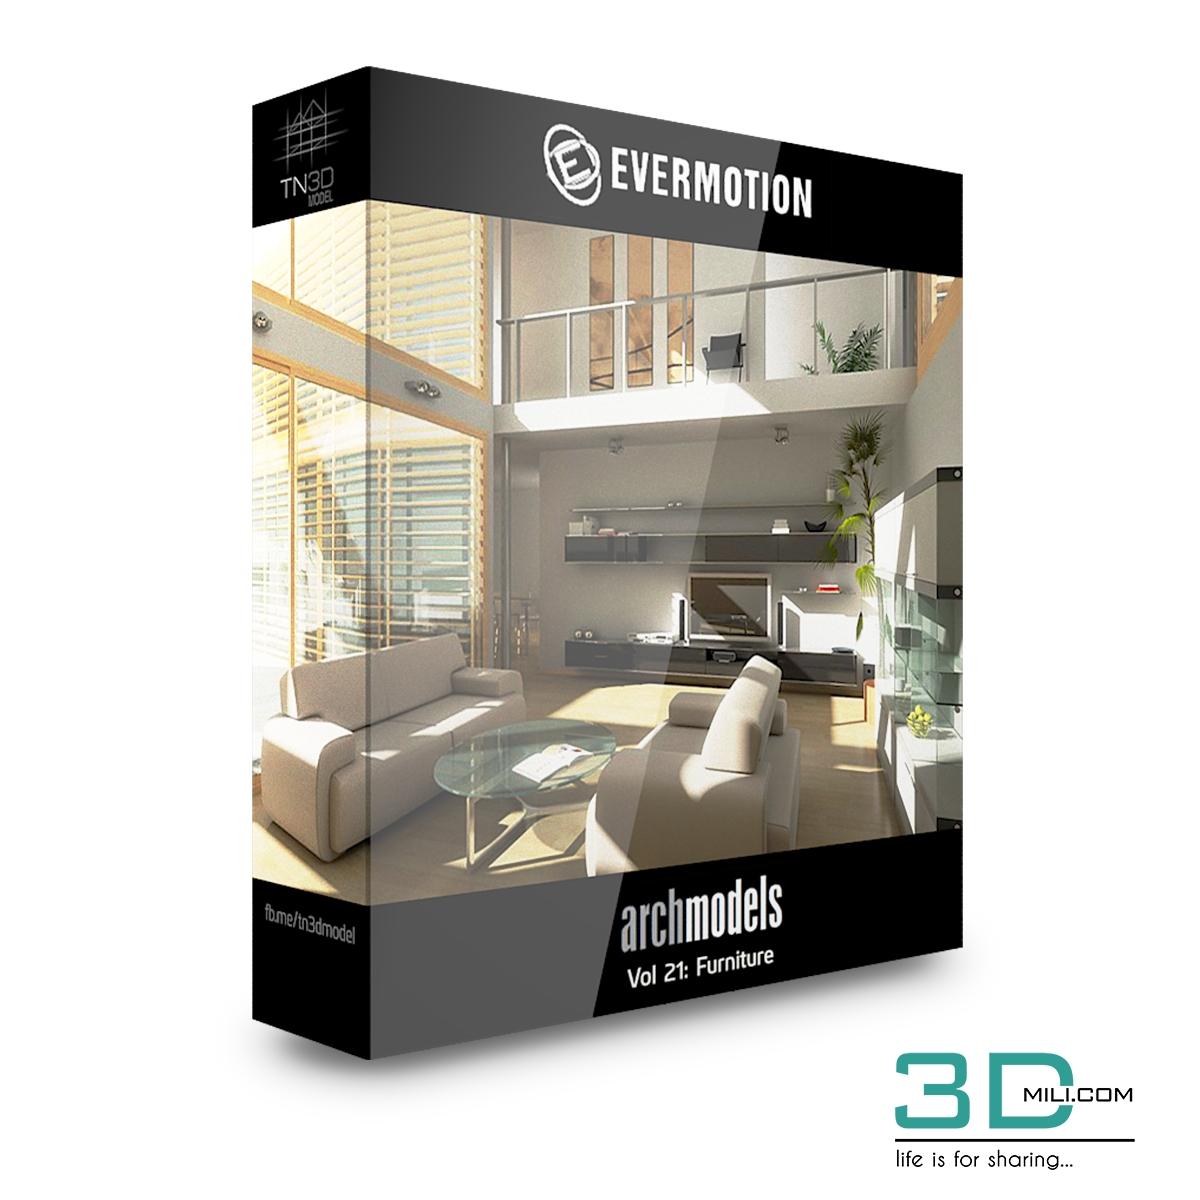 Evermotion Archmodels Vol 21: Furniture - 3D Mili - Download 3D